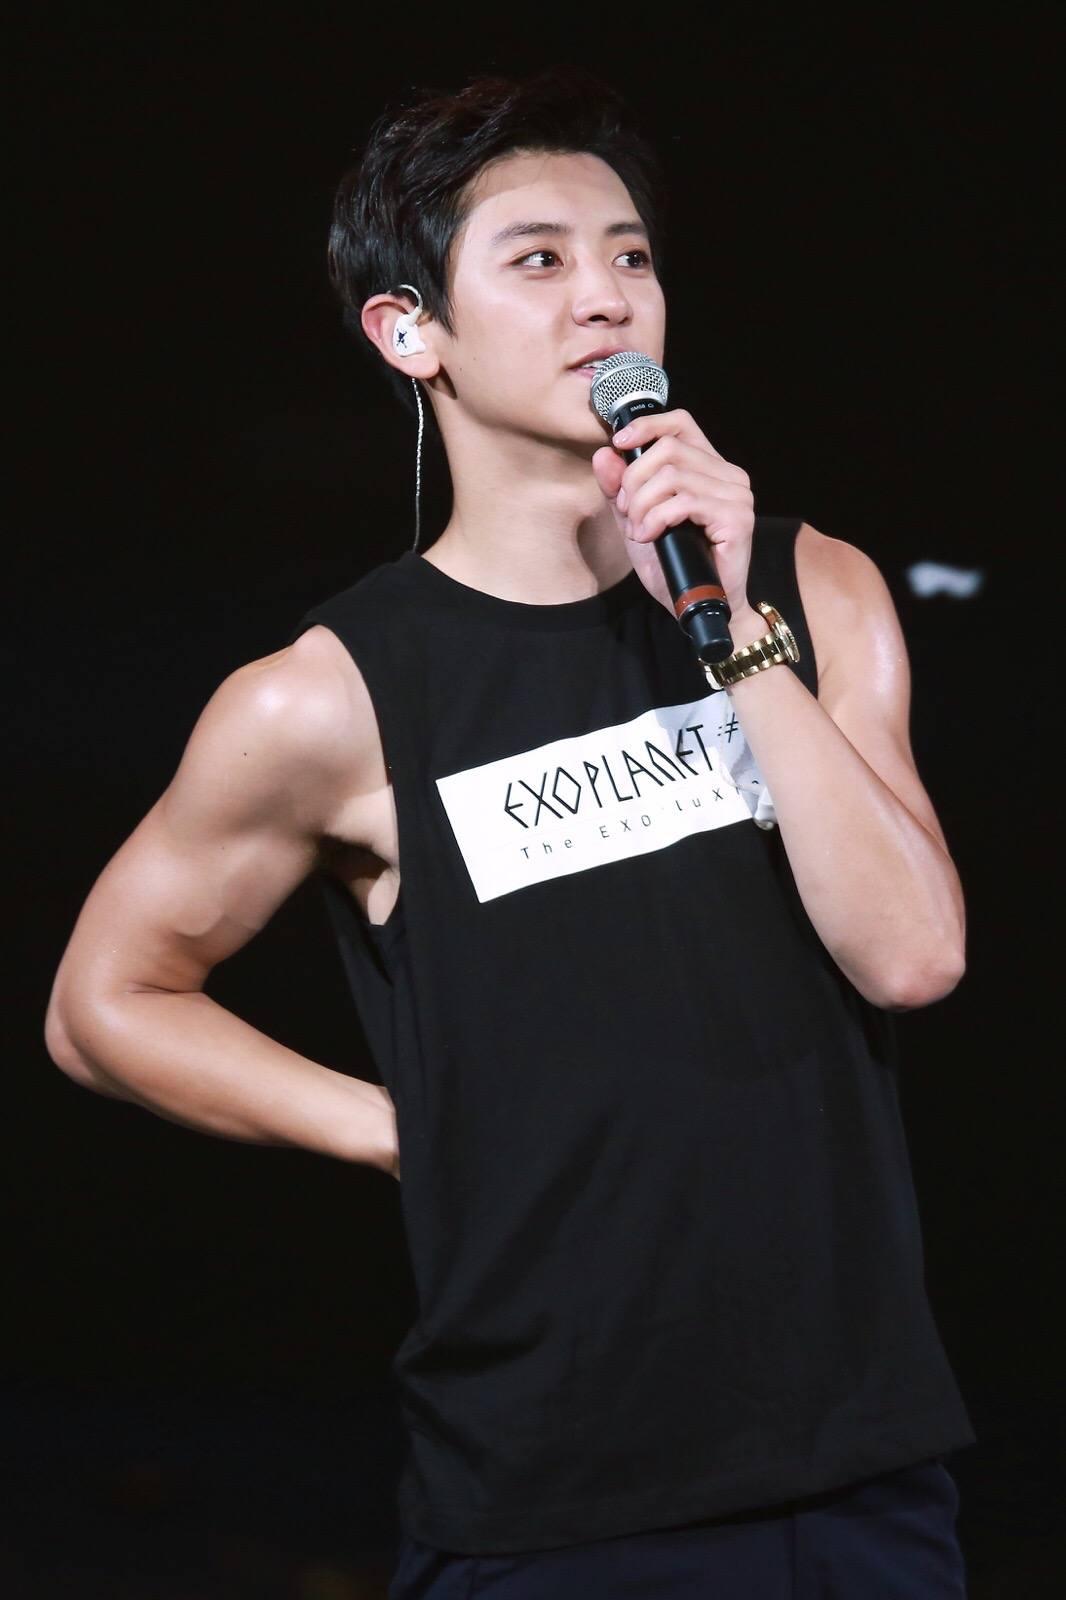 Chanyeol abs